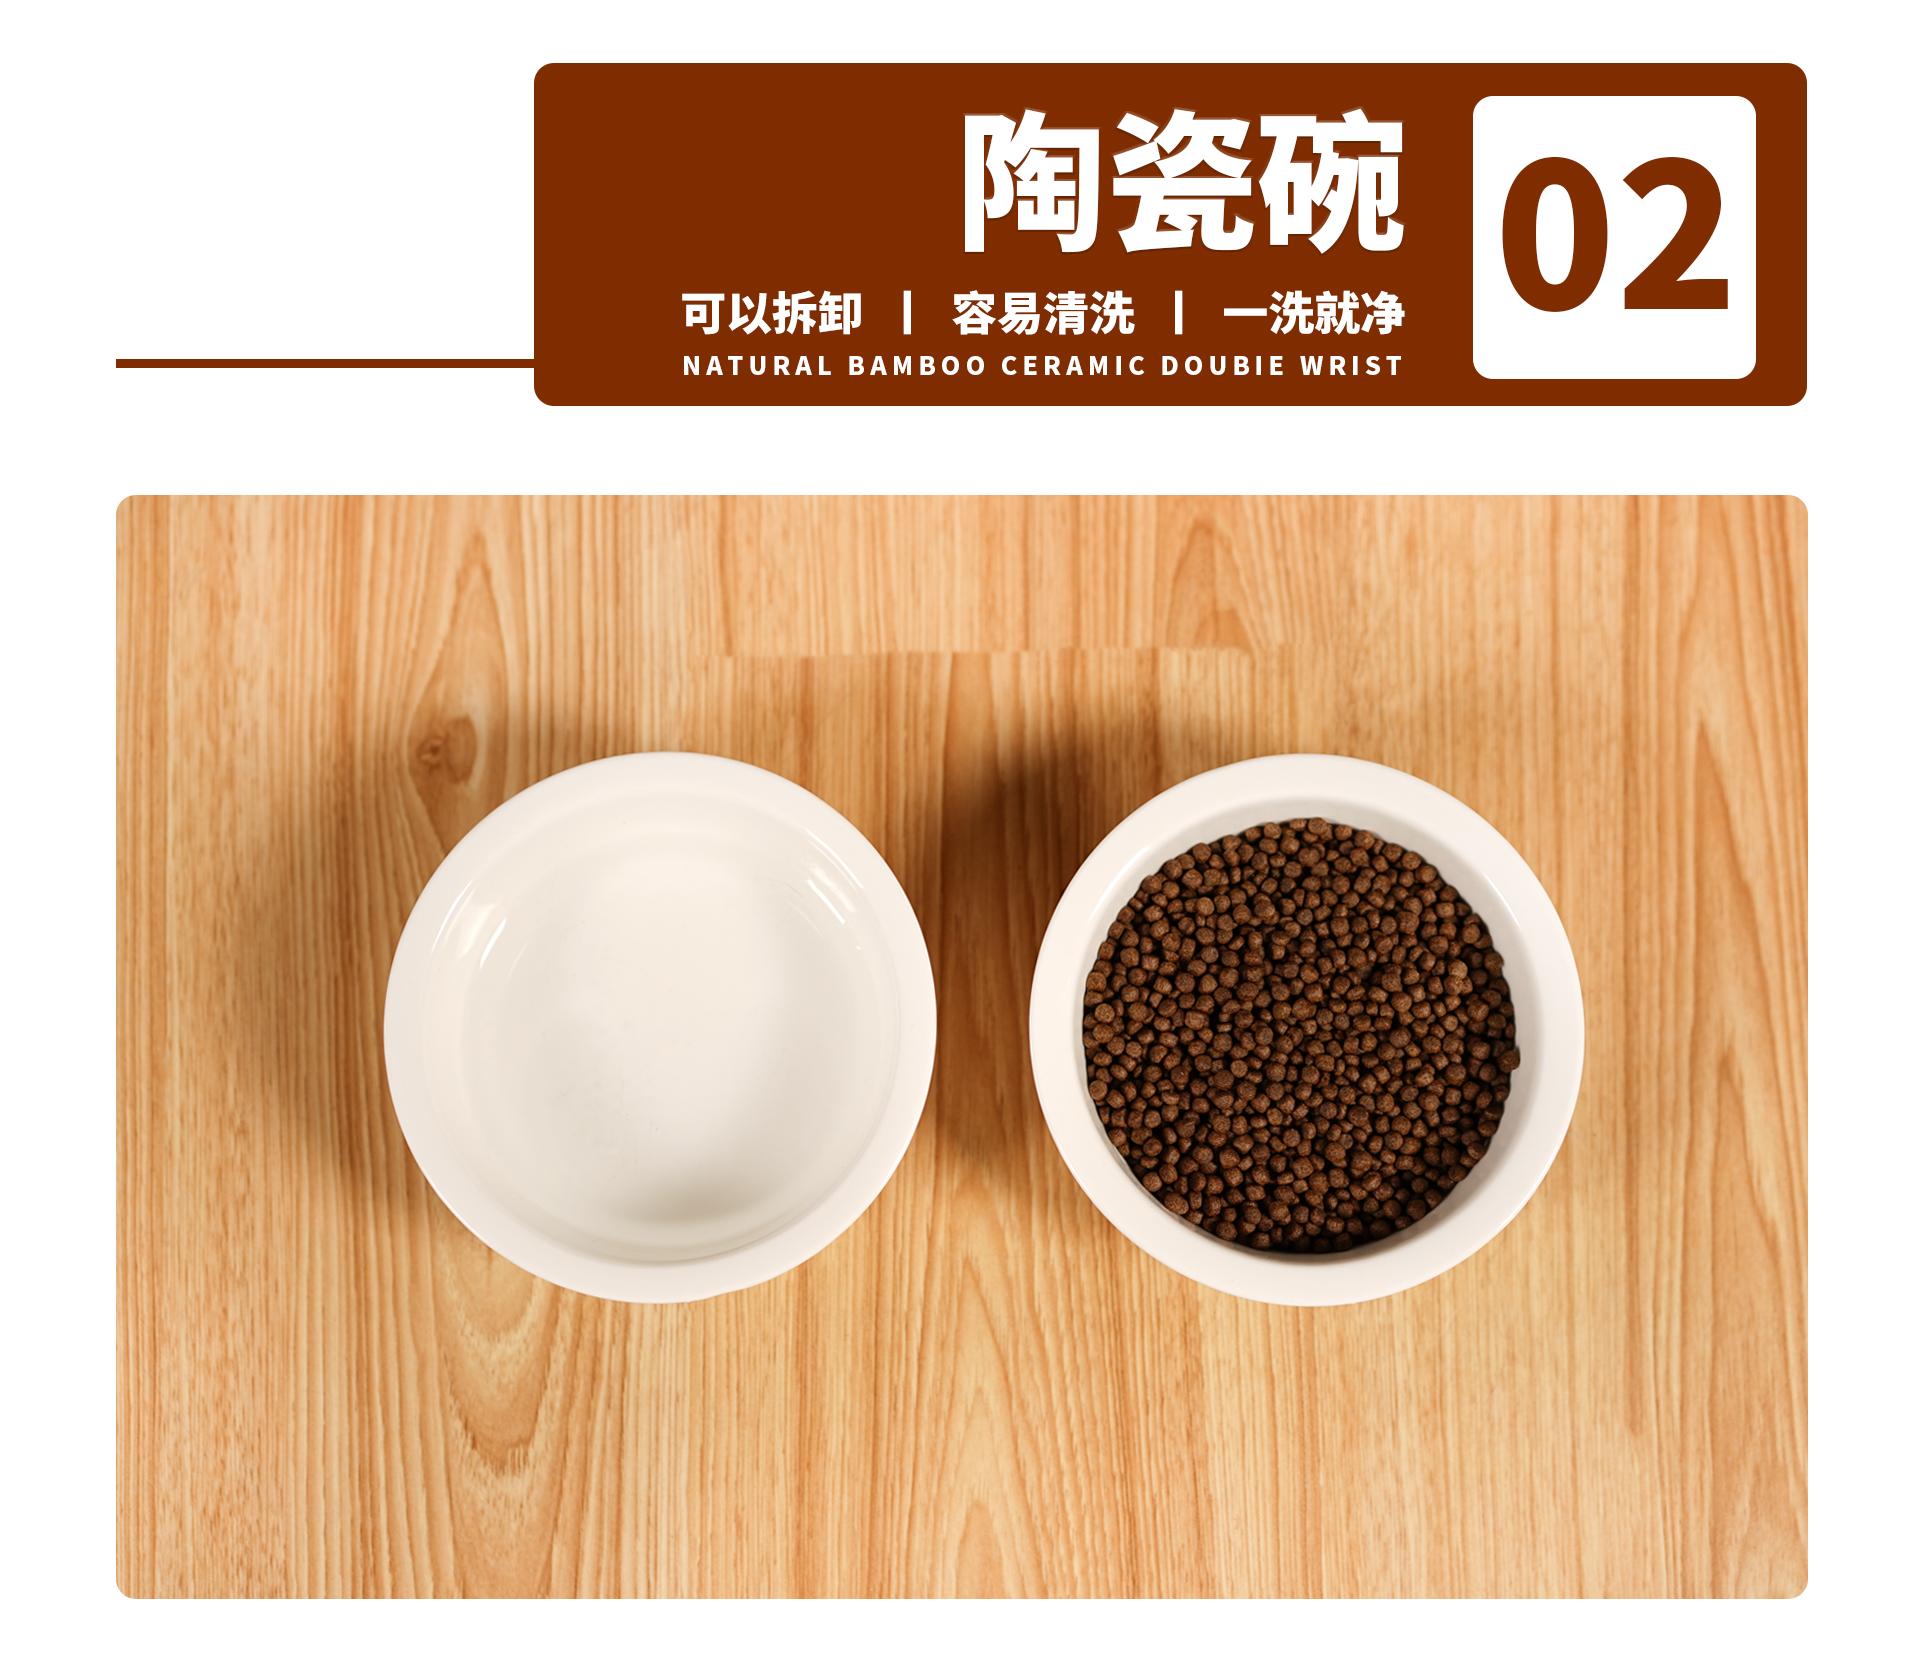 Double bowl basin cat cat cat bowl bowl dog bowl tub pet ceramic cat food rice basin cat food bowl of cat products